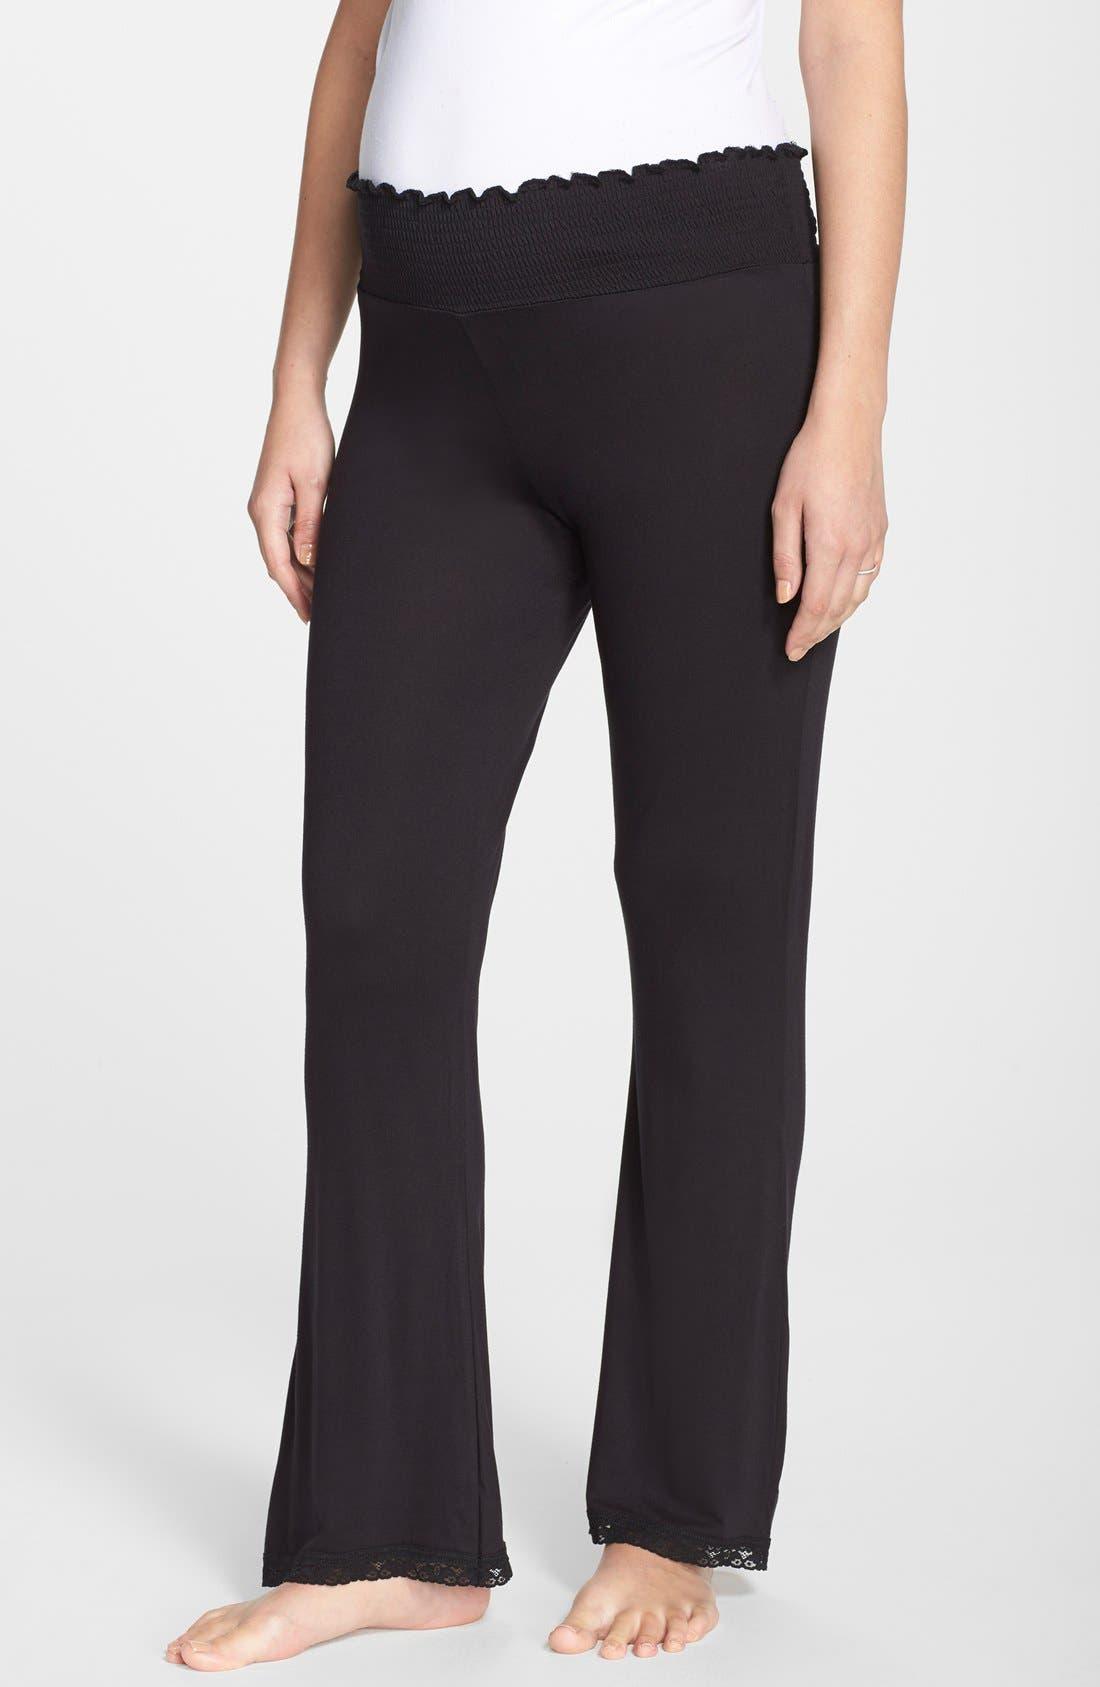 Lace Trim Maternity Lounge Pants,                             Main thumbnail 1, color,                             Black